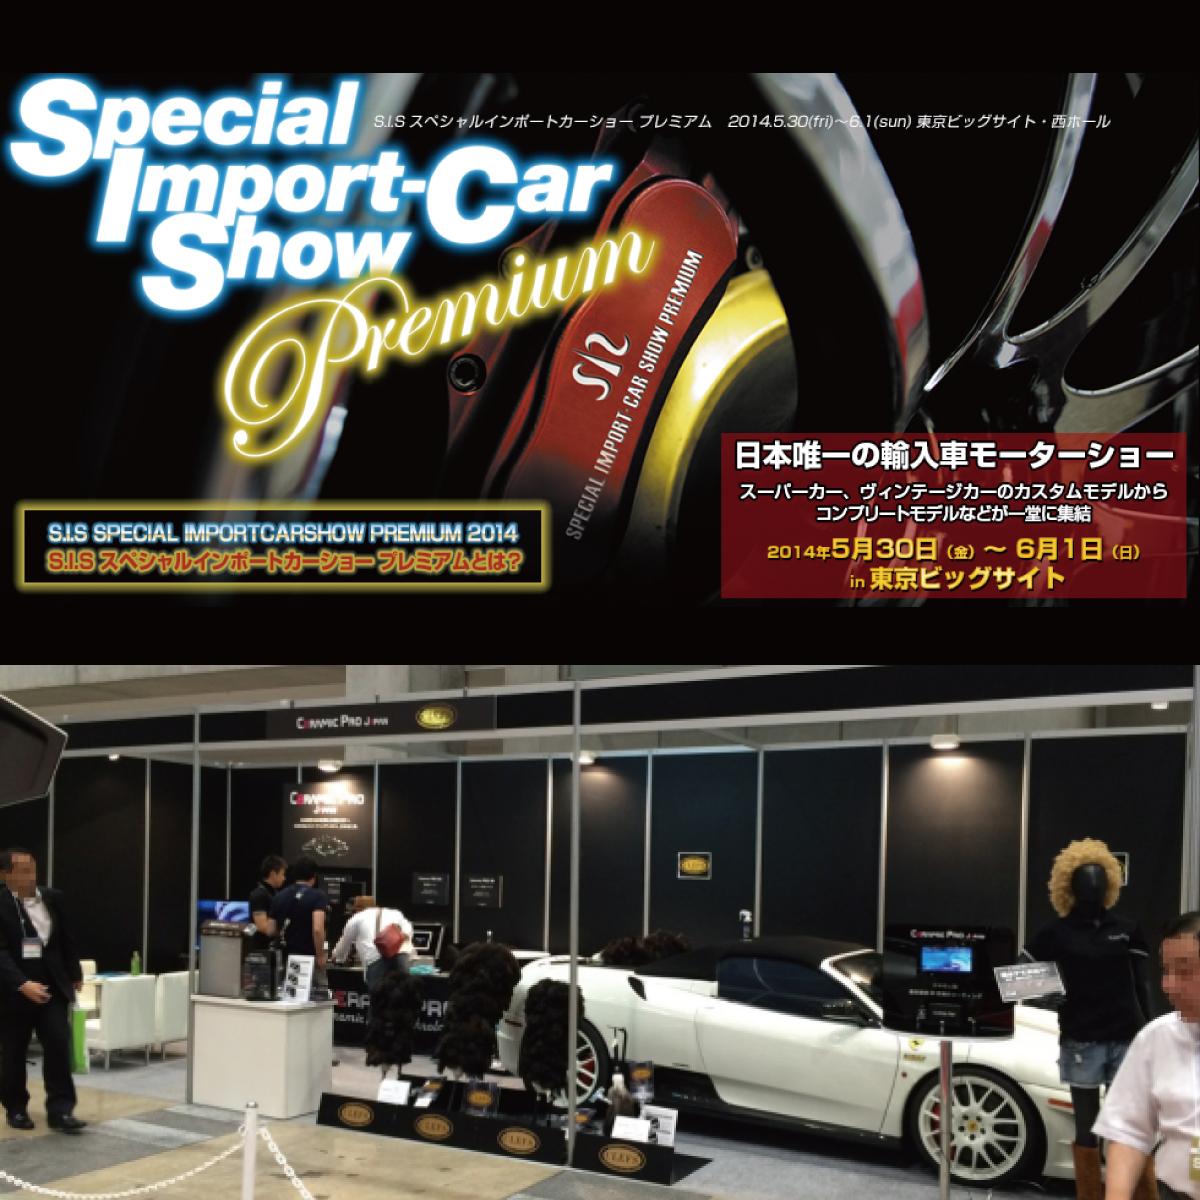 CLEFS毛ばたき + S.I.S スペシャルインポートカーショープレミアム2014